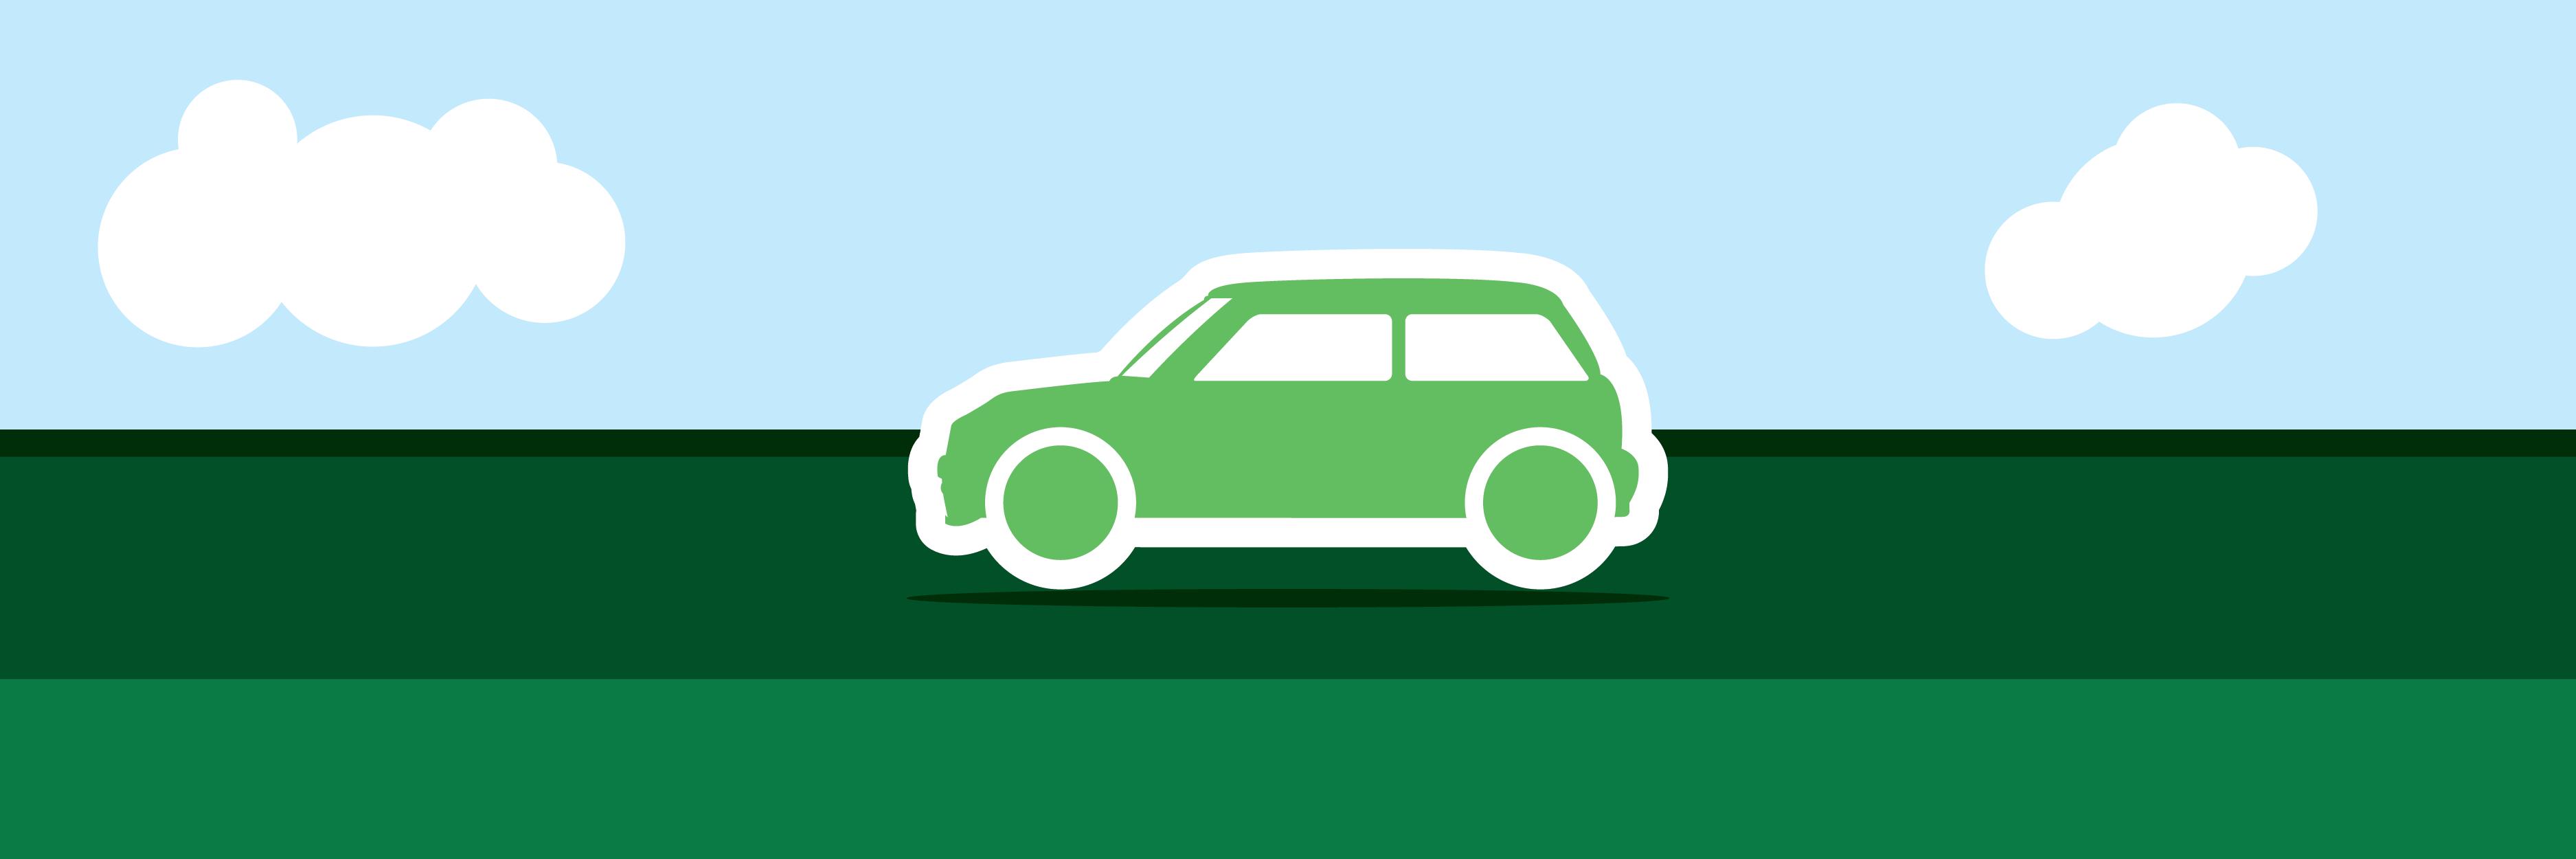 Seguro Auto com Cobertura Completa